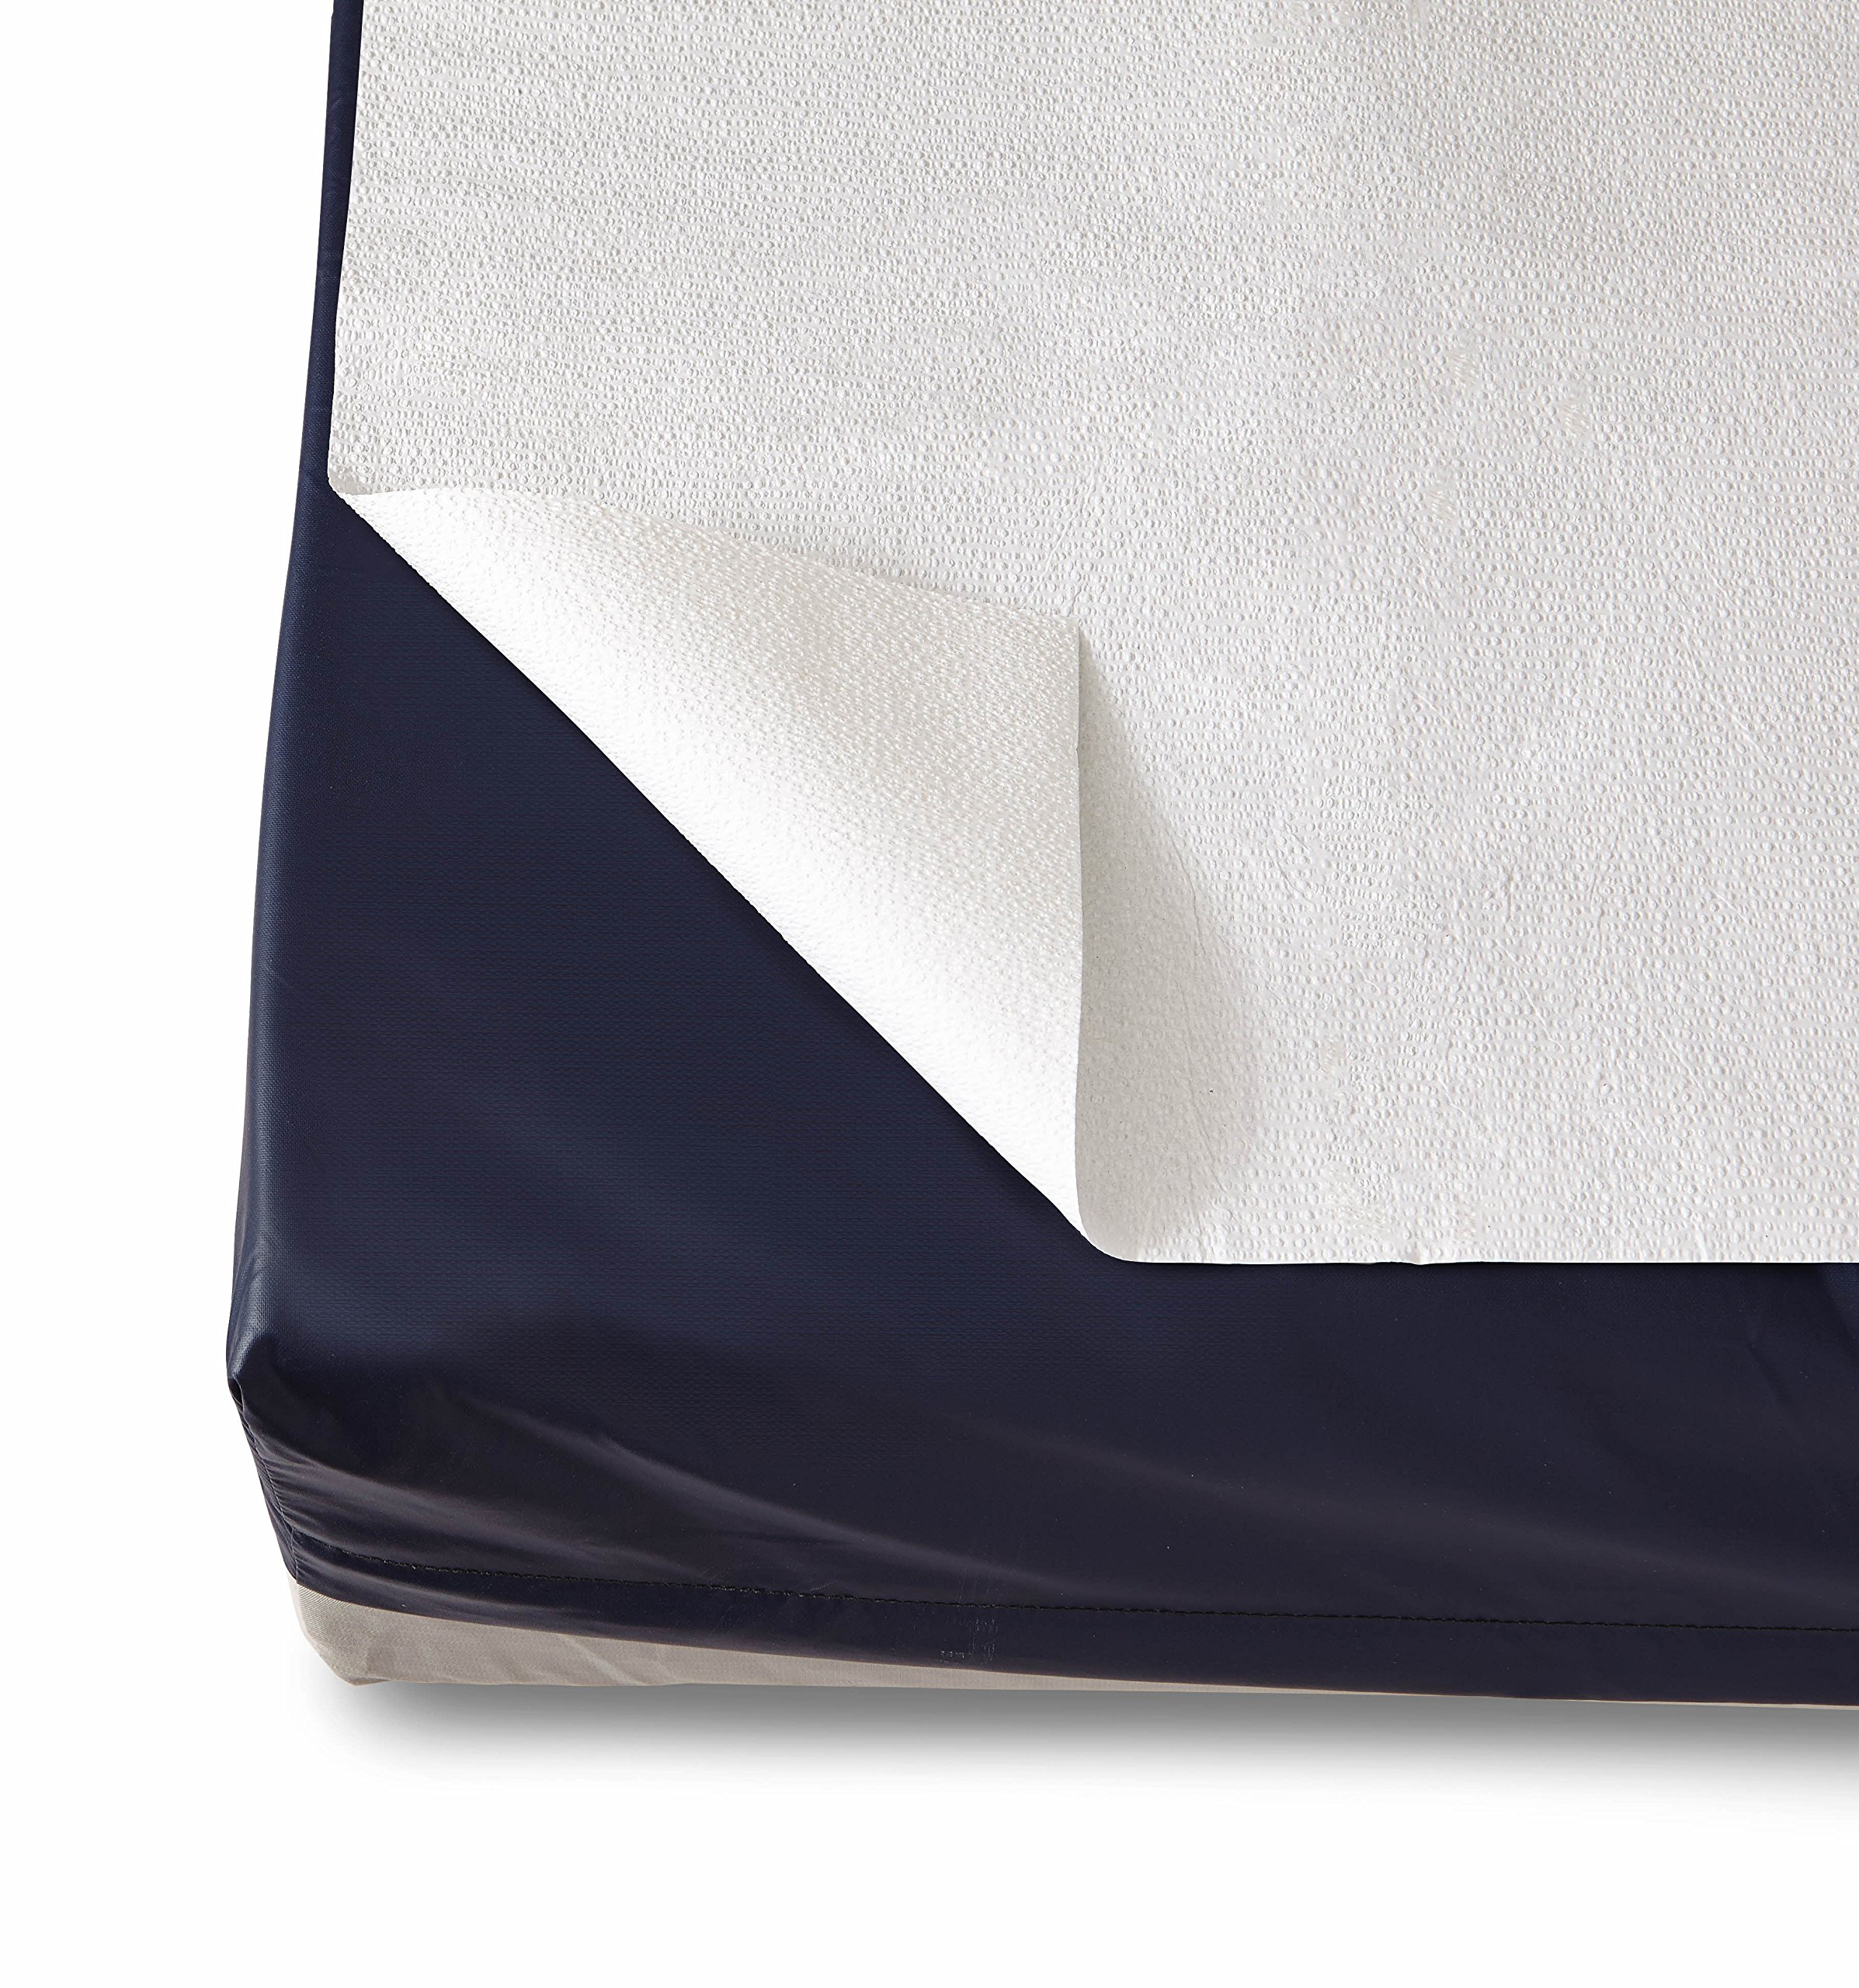 Medline NON24339A Tissue Drape Sheets, 2-ply, 40'' x 60'', White (Pack of 100)